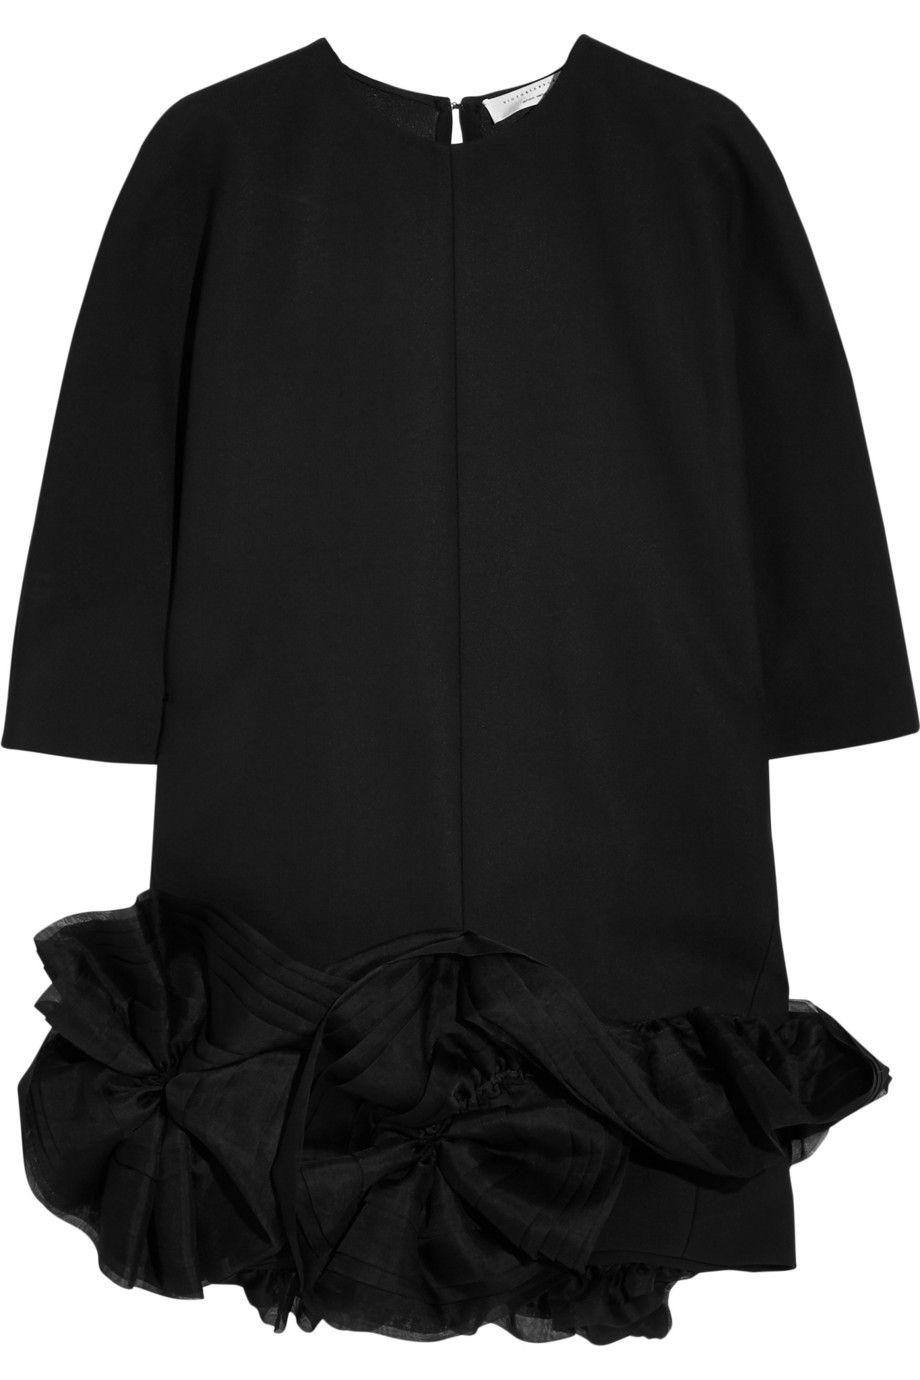 Victoria Beckham|Silk organza-trimmed crepe mini dress|NET-A-PORTER.COM